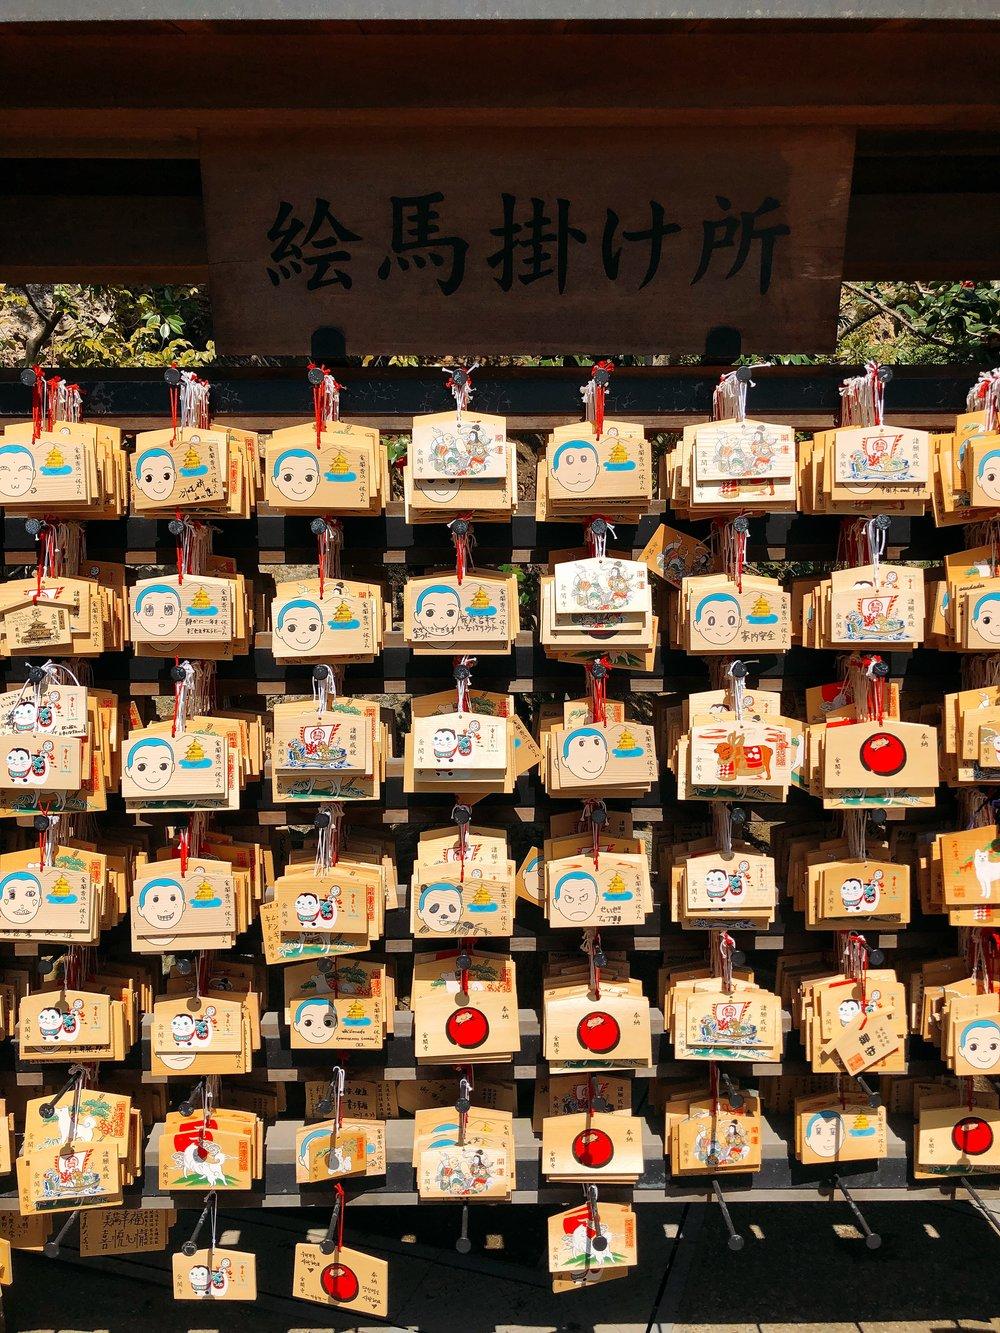 The Ema At Kinkaku-ji. I Just Adore The Illustrations!